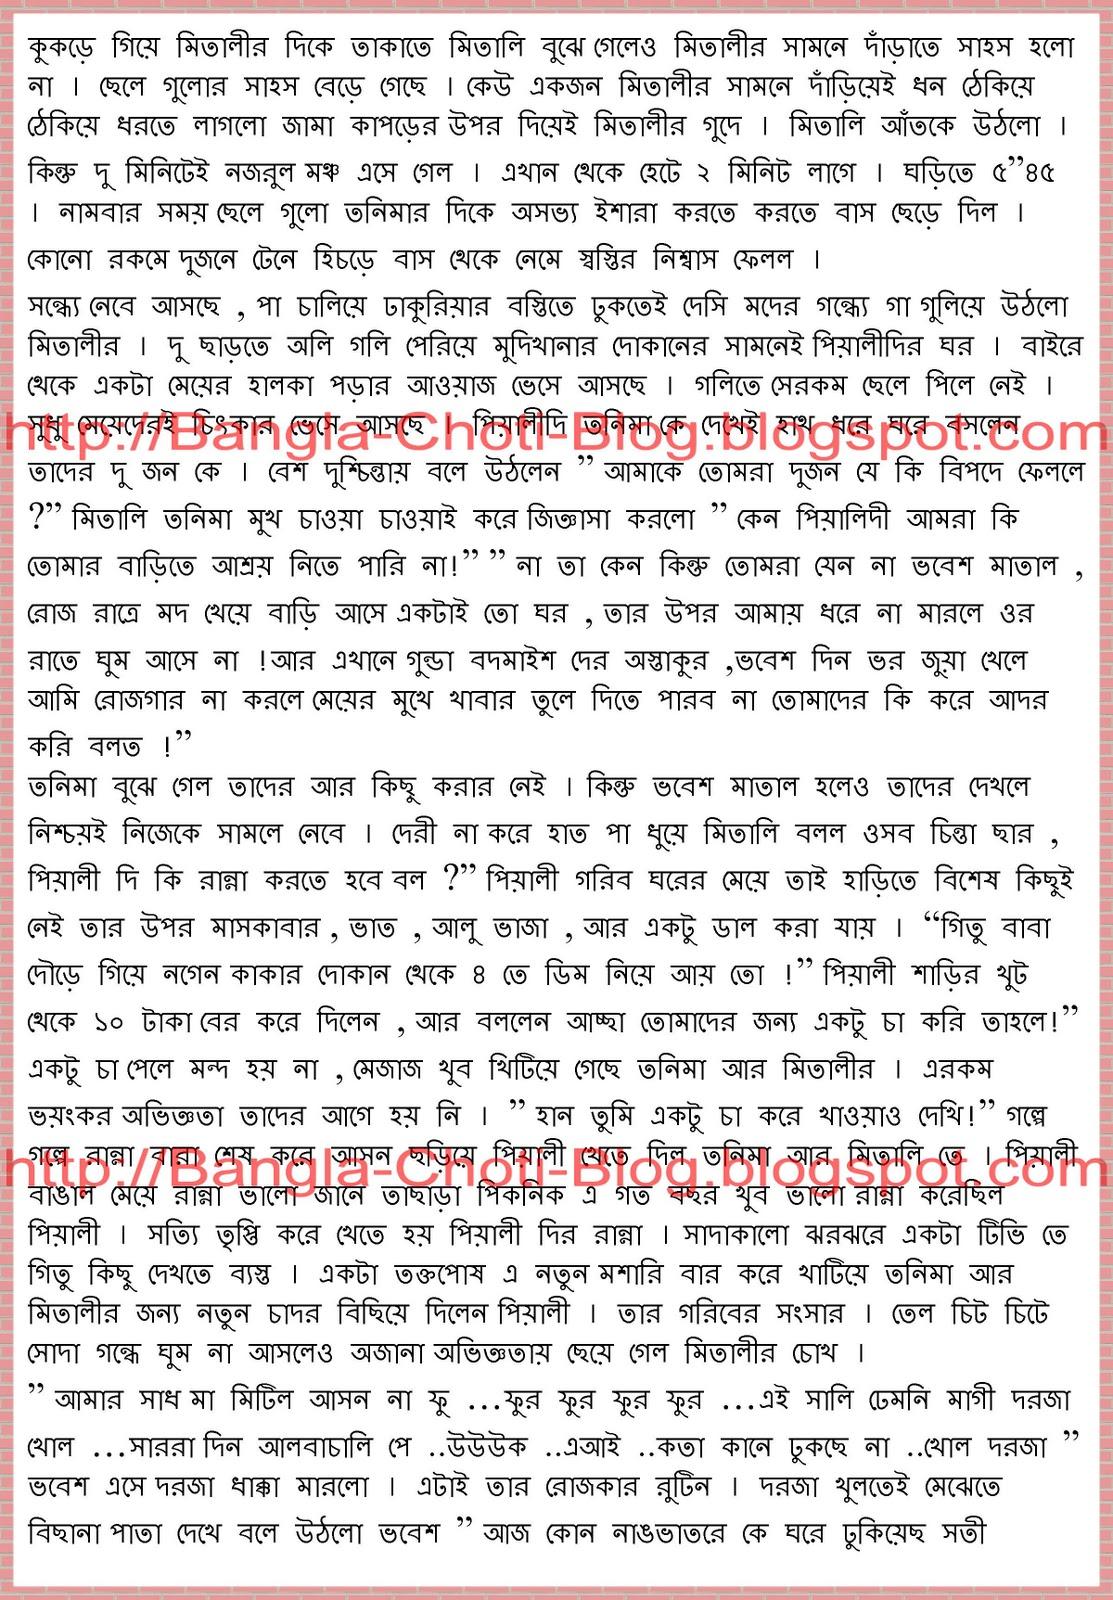 Bengali porn picture story pics 175